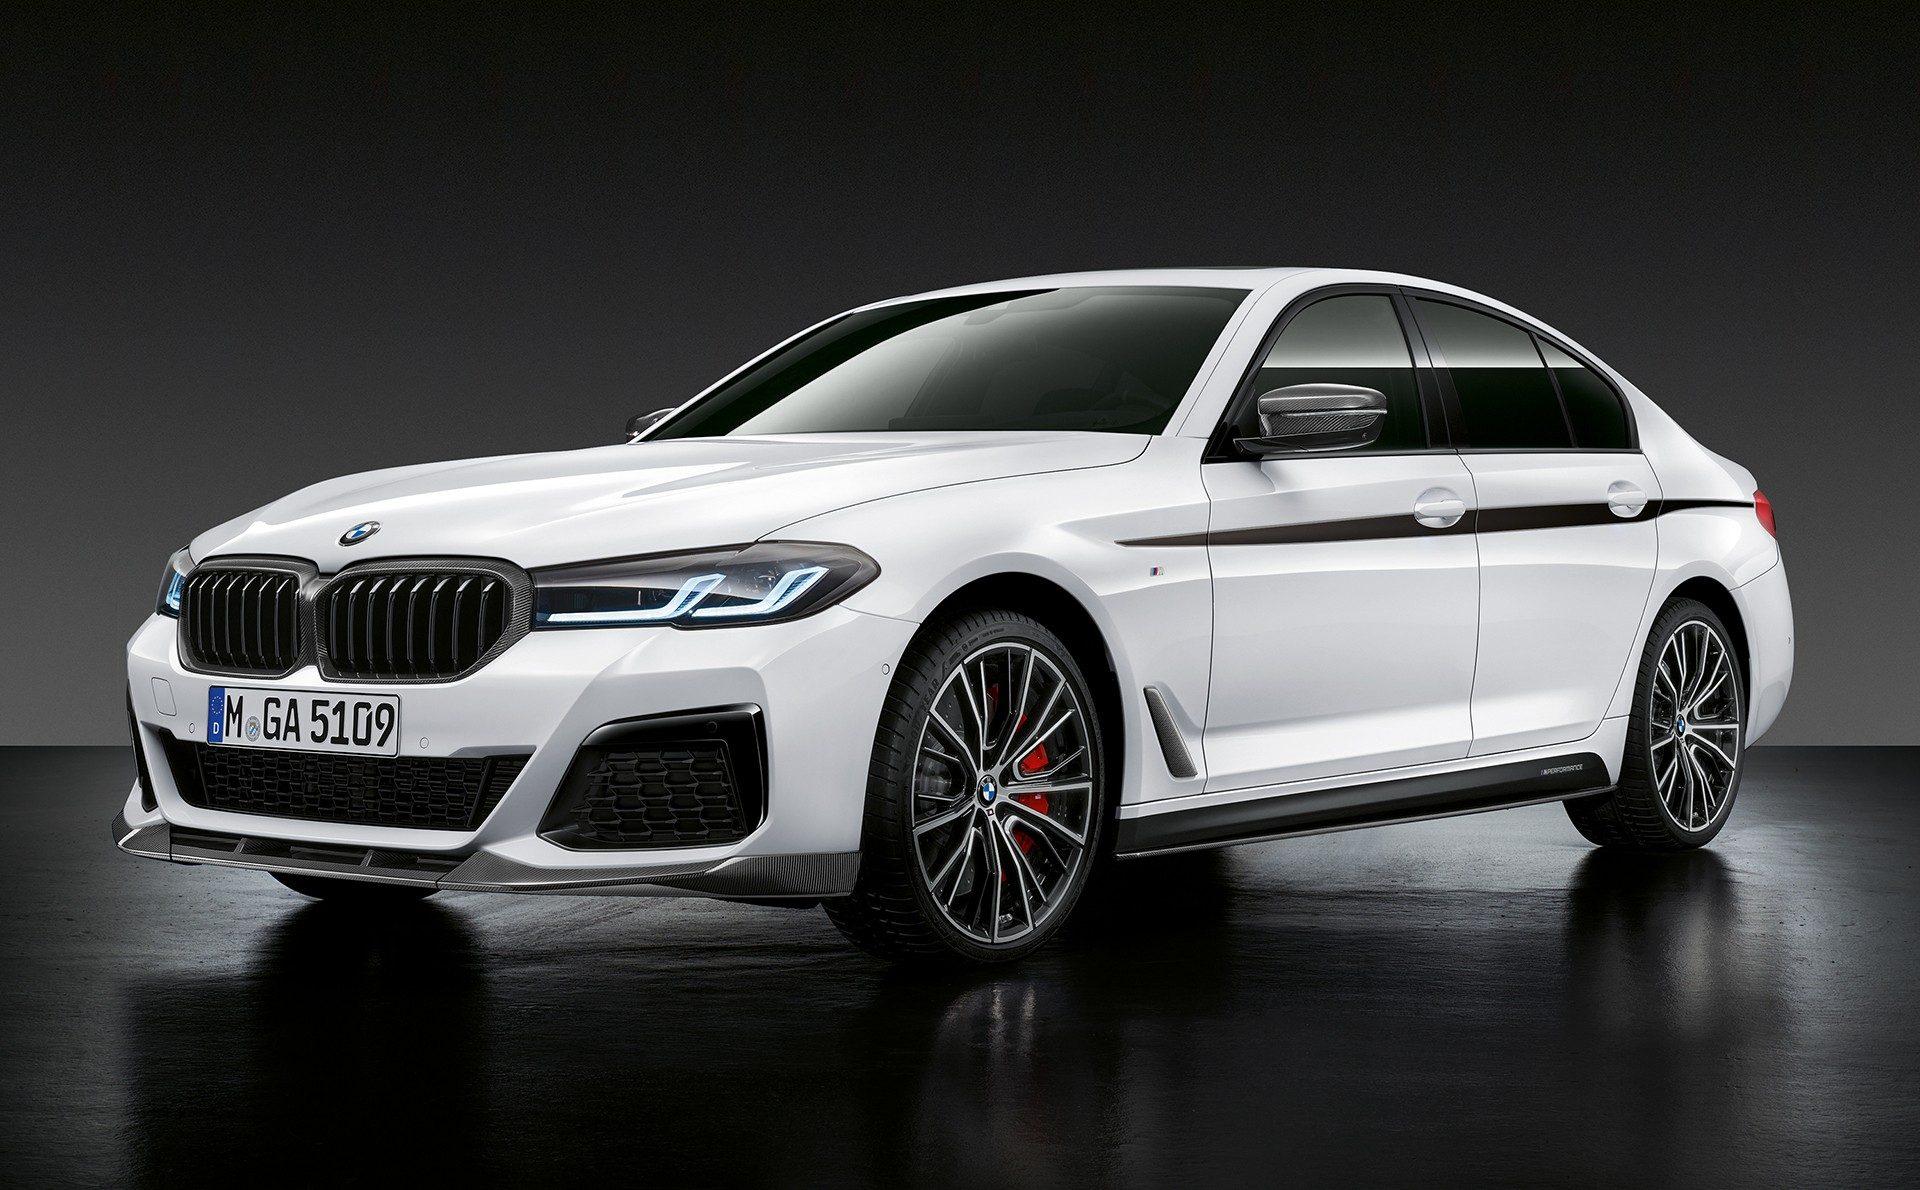 Nuova BMW M5 2021, dati tecnici ufficiali, uscita